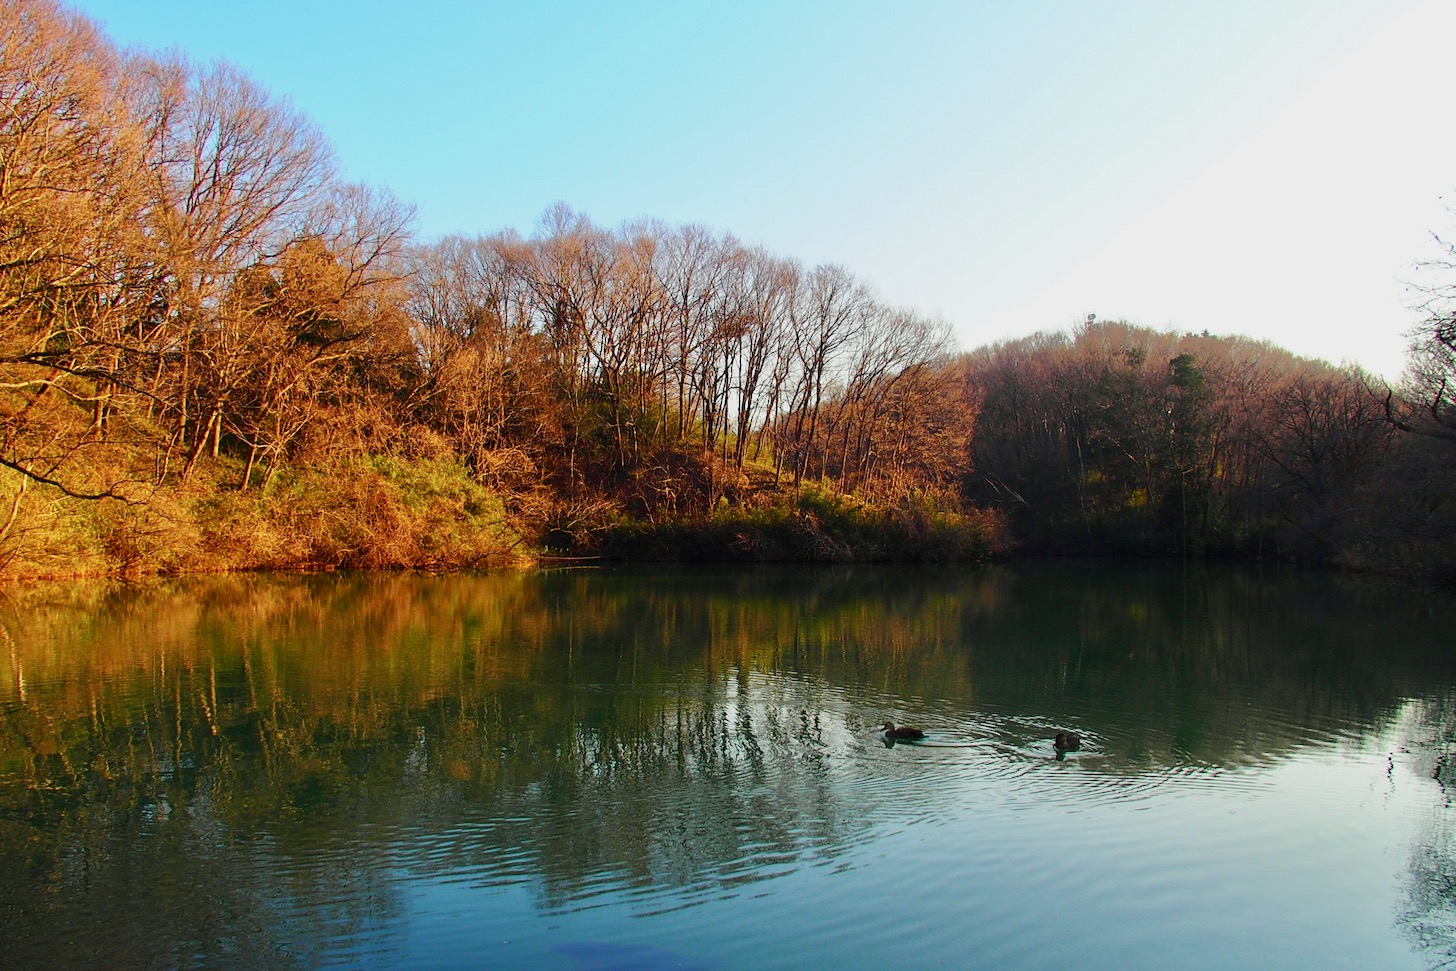 八王子市・長池公園の築池